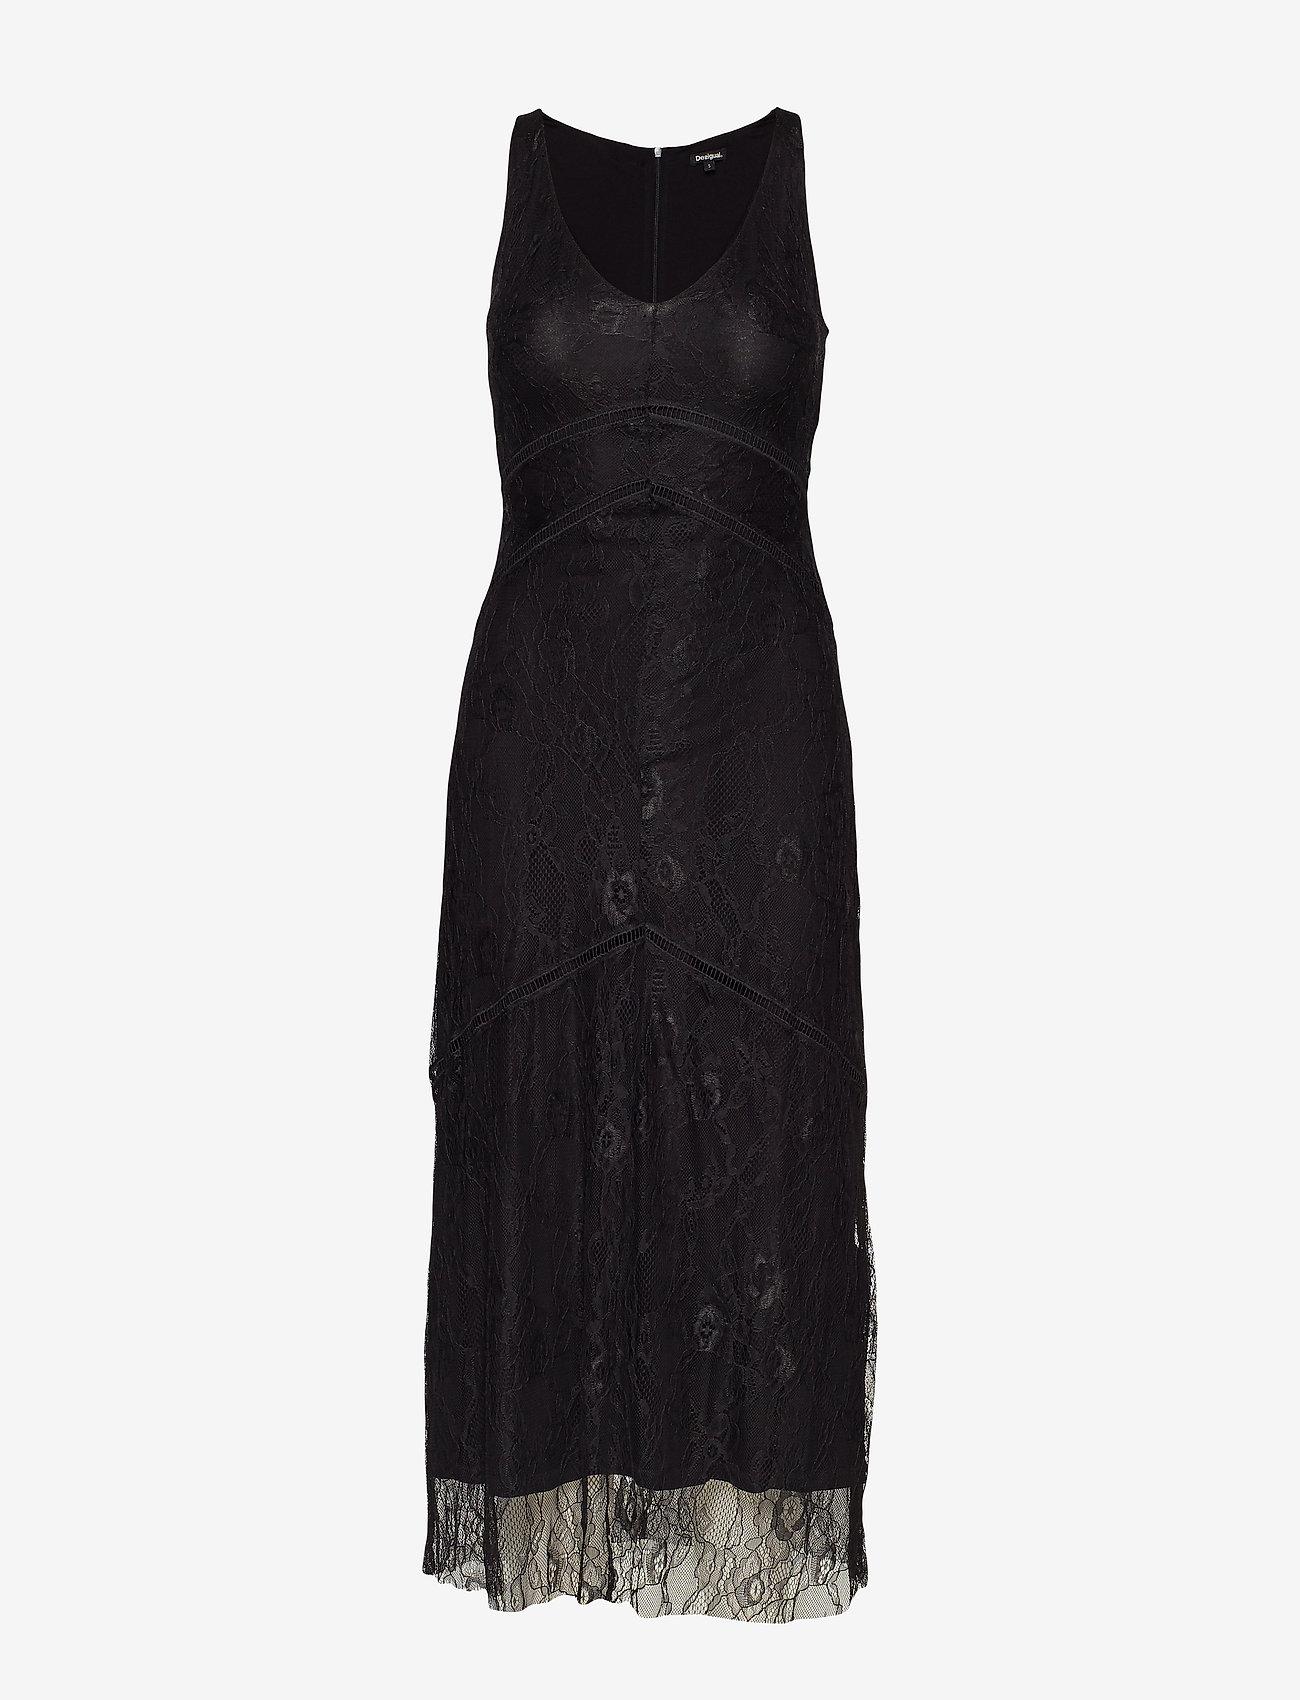 Desigual - VEST LAMAR - midi jurken - negro - 0